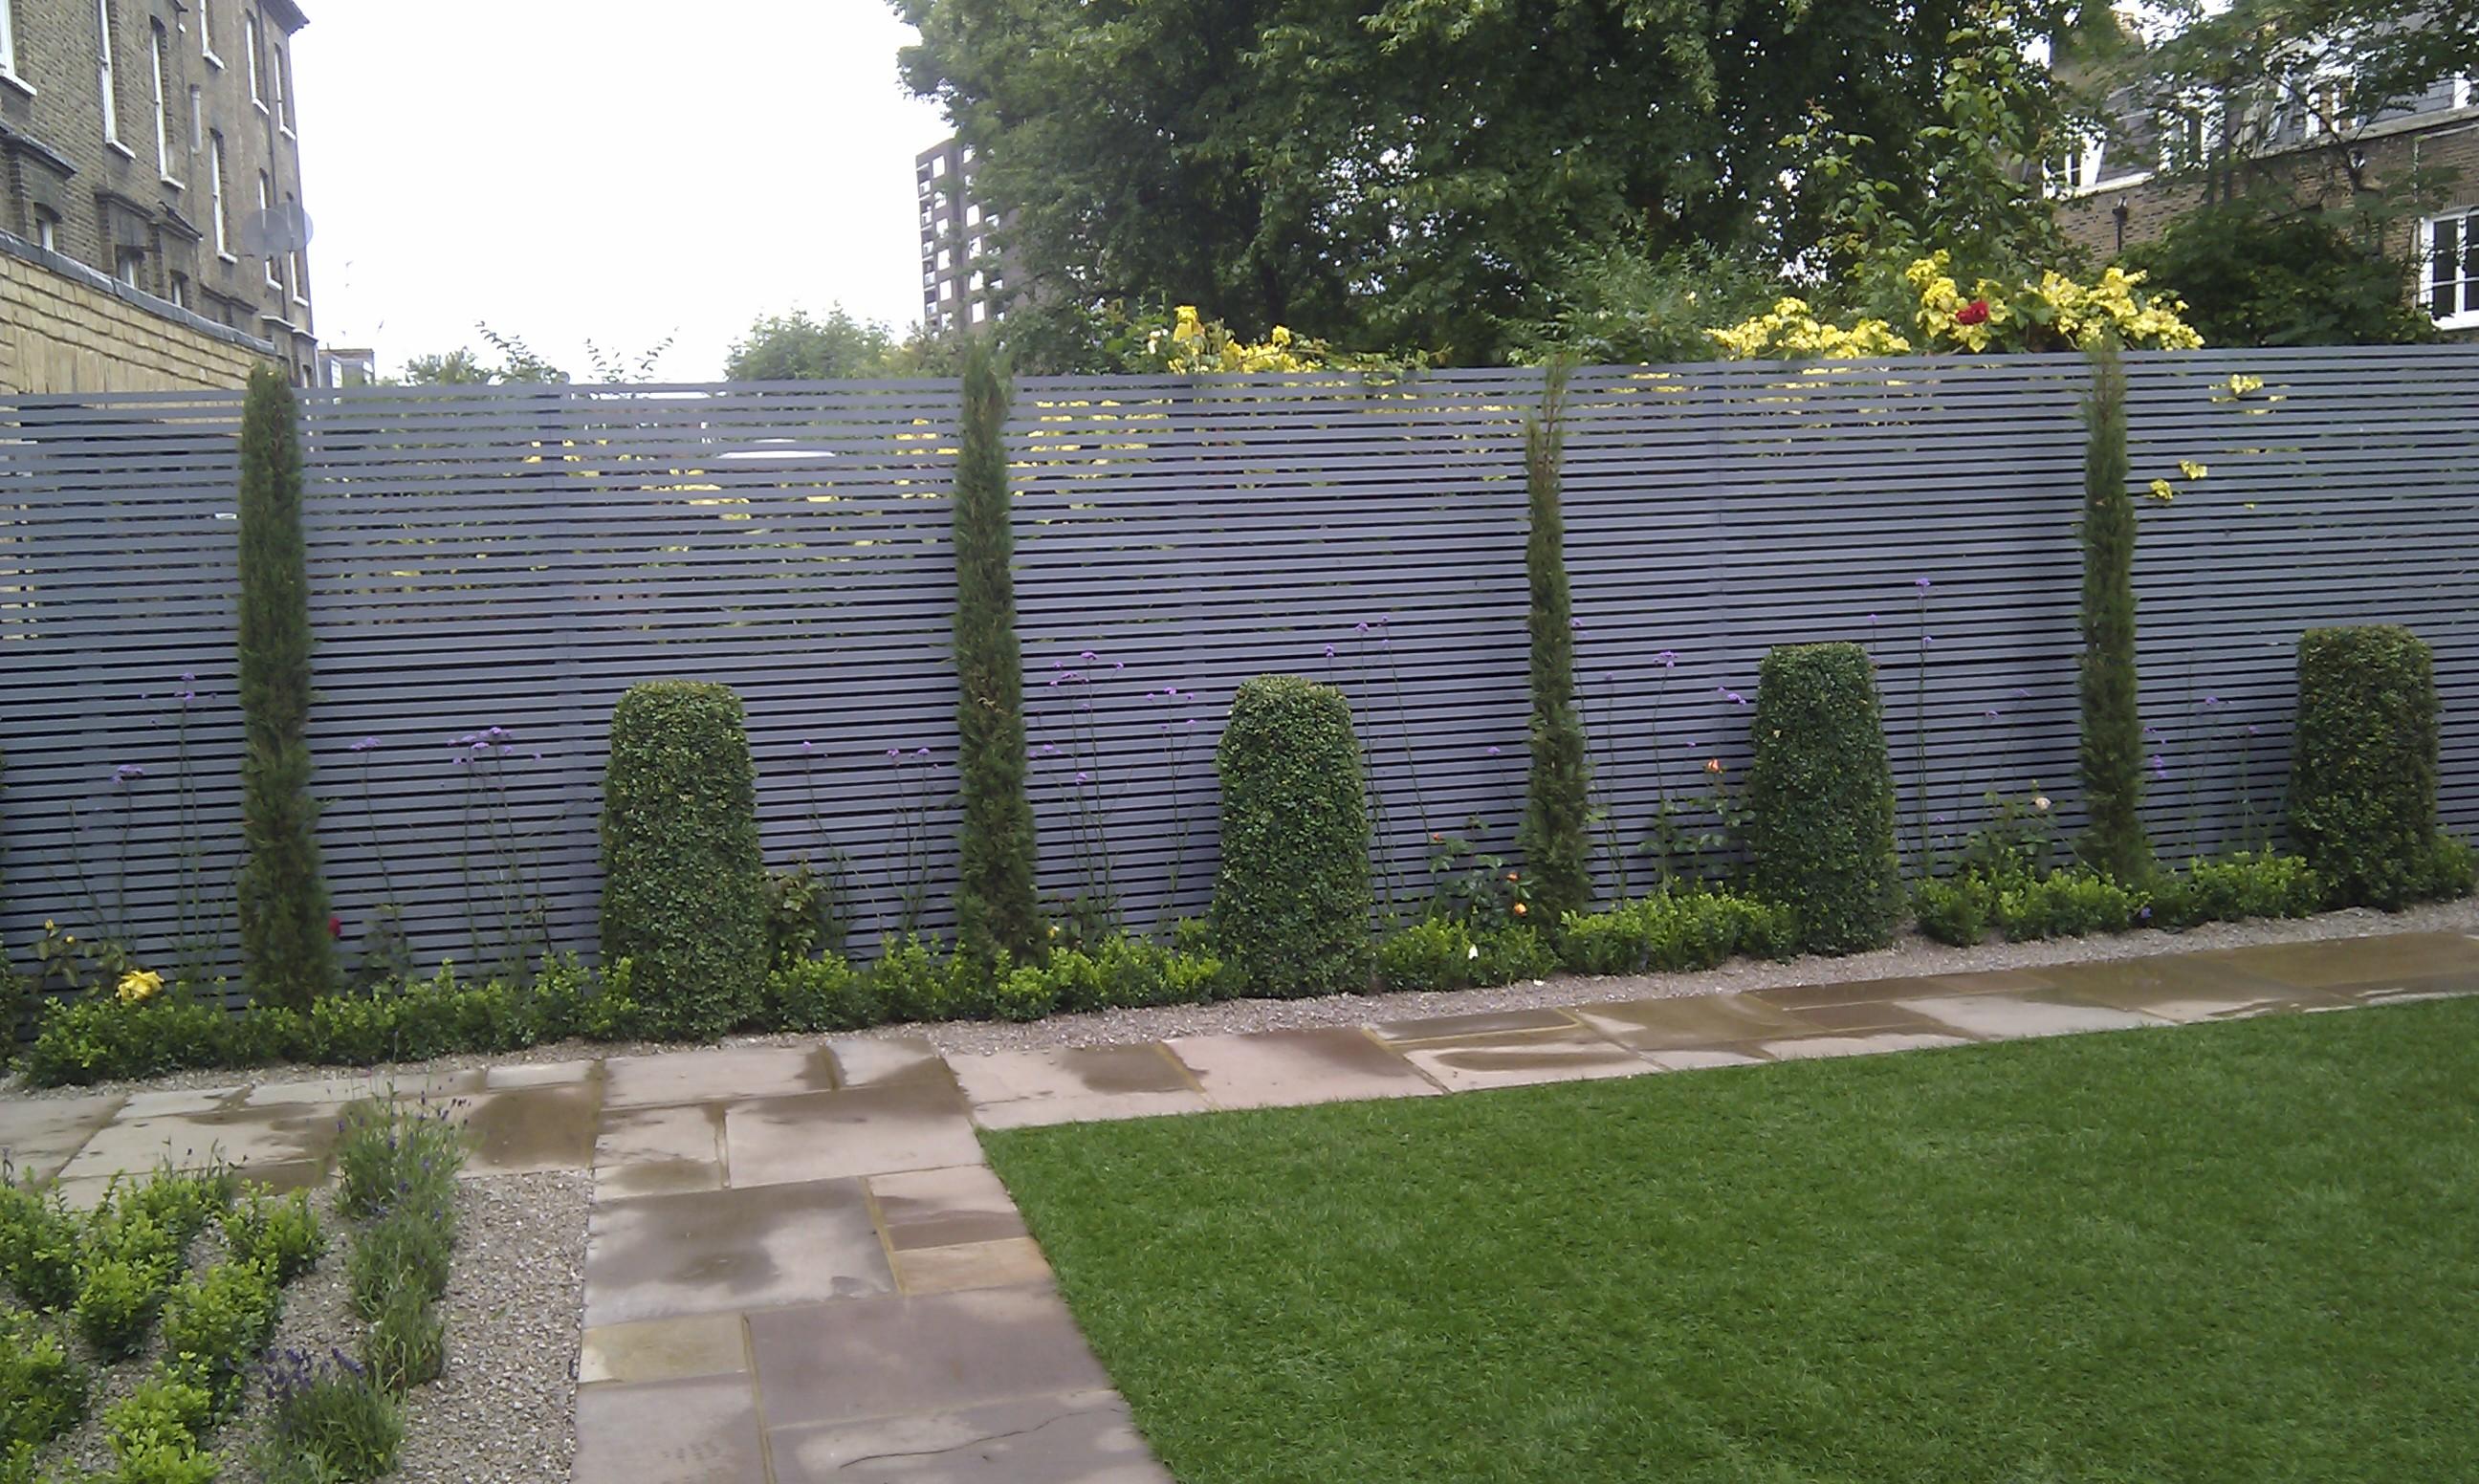 modern garden design london slatted grey privacy screen sandstone paving easy grass balau hardwood decking (17)